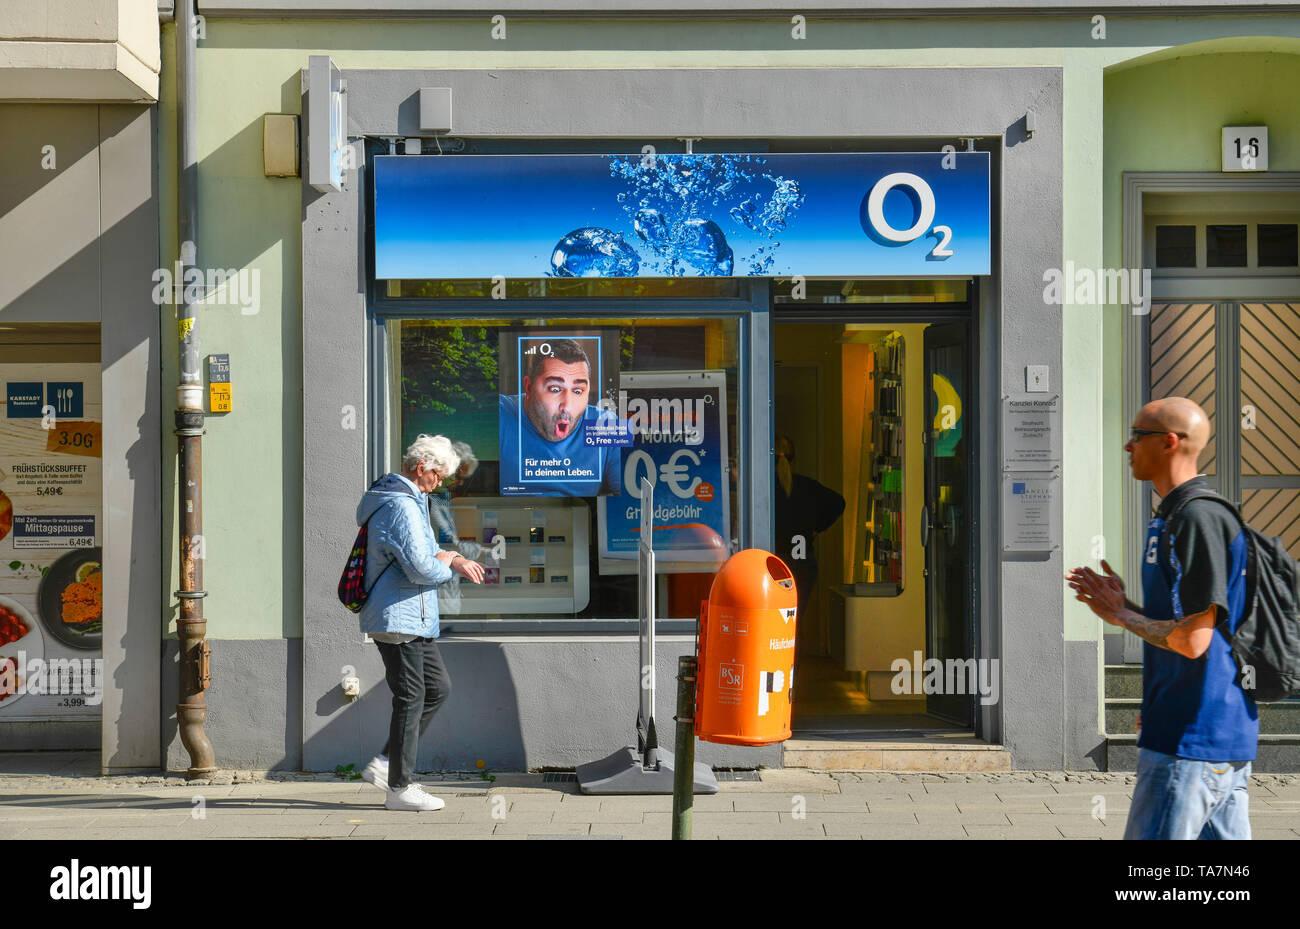 O2, Carl apron street, Old Town, Spandau, Berlin, Germany, Carl-Schurz-Straße, Altstadt, Deutschland - Stock Image